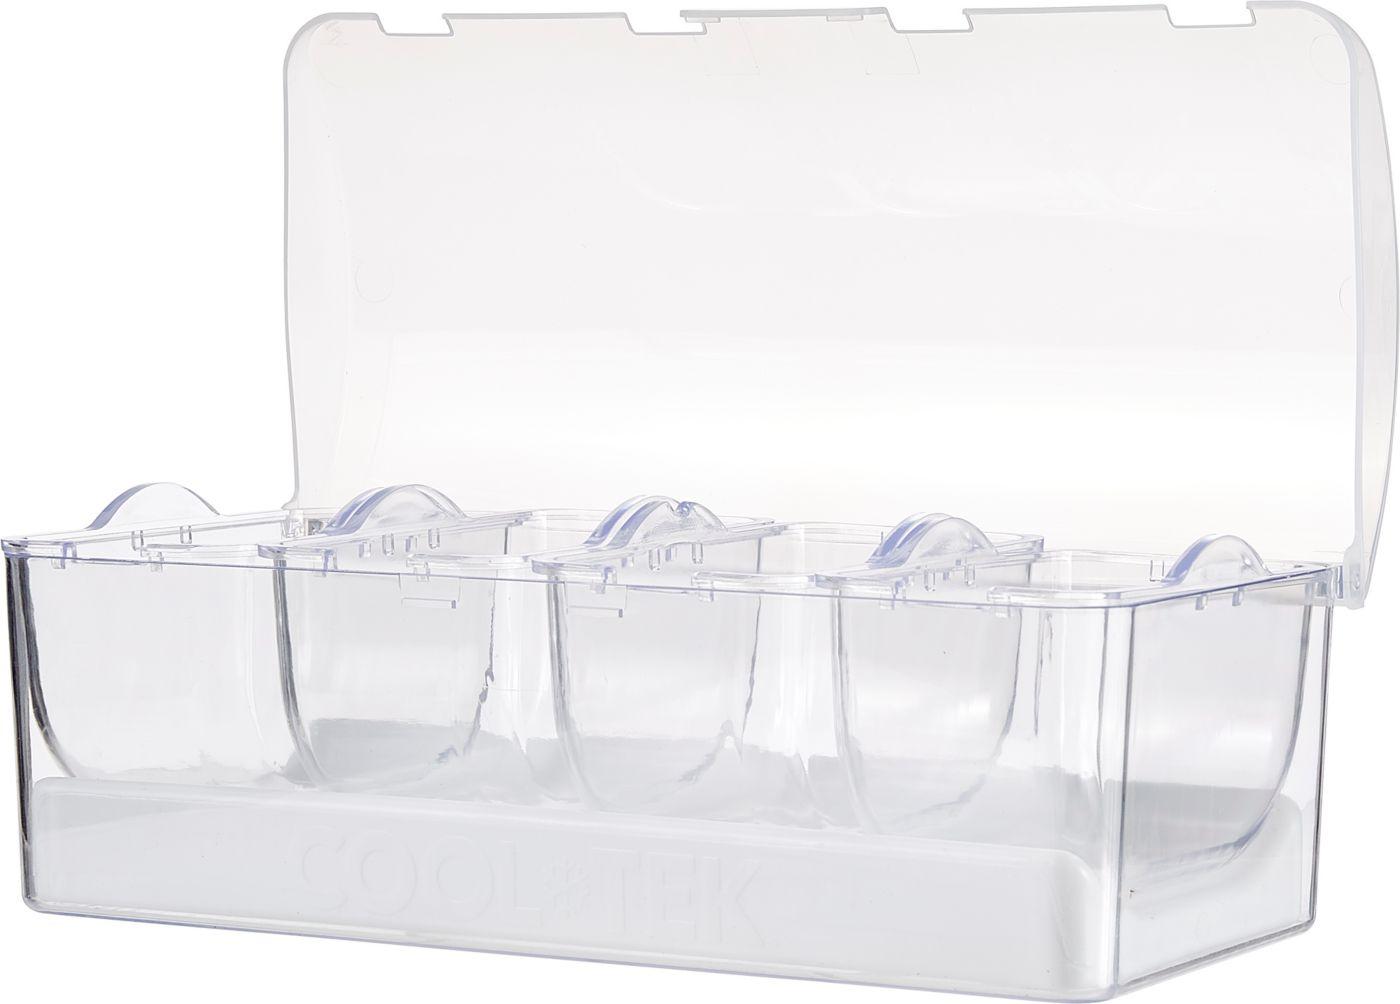 Field & Stream Cool-Tek Condiment Caddy